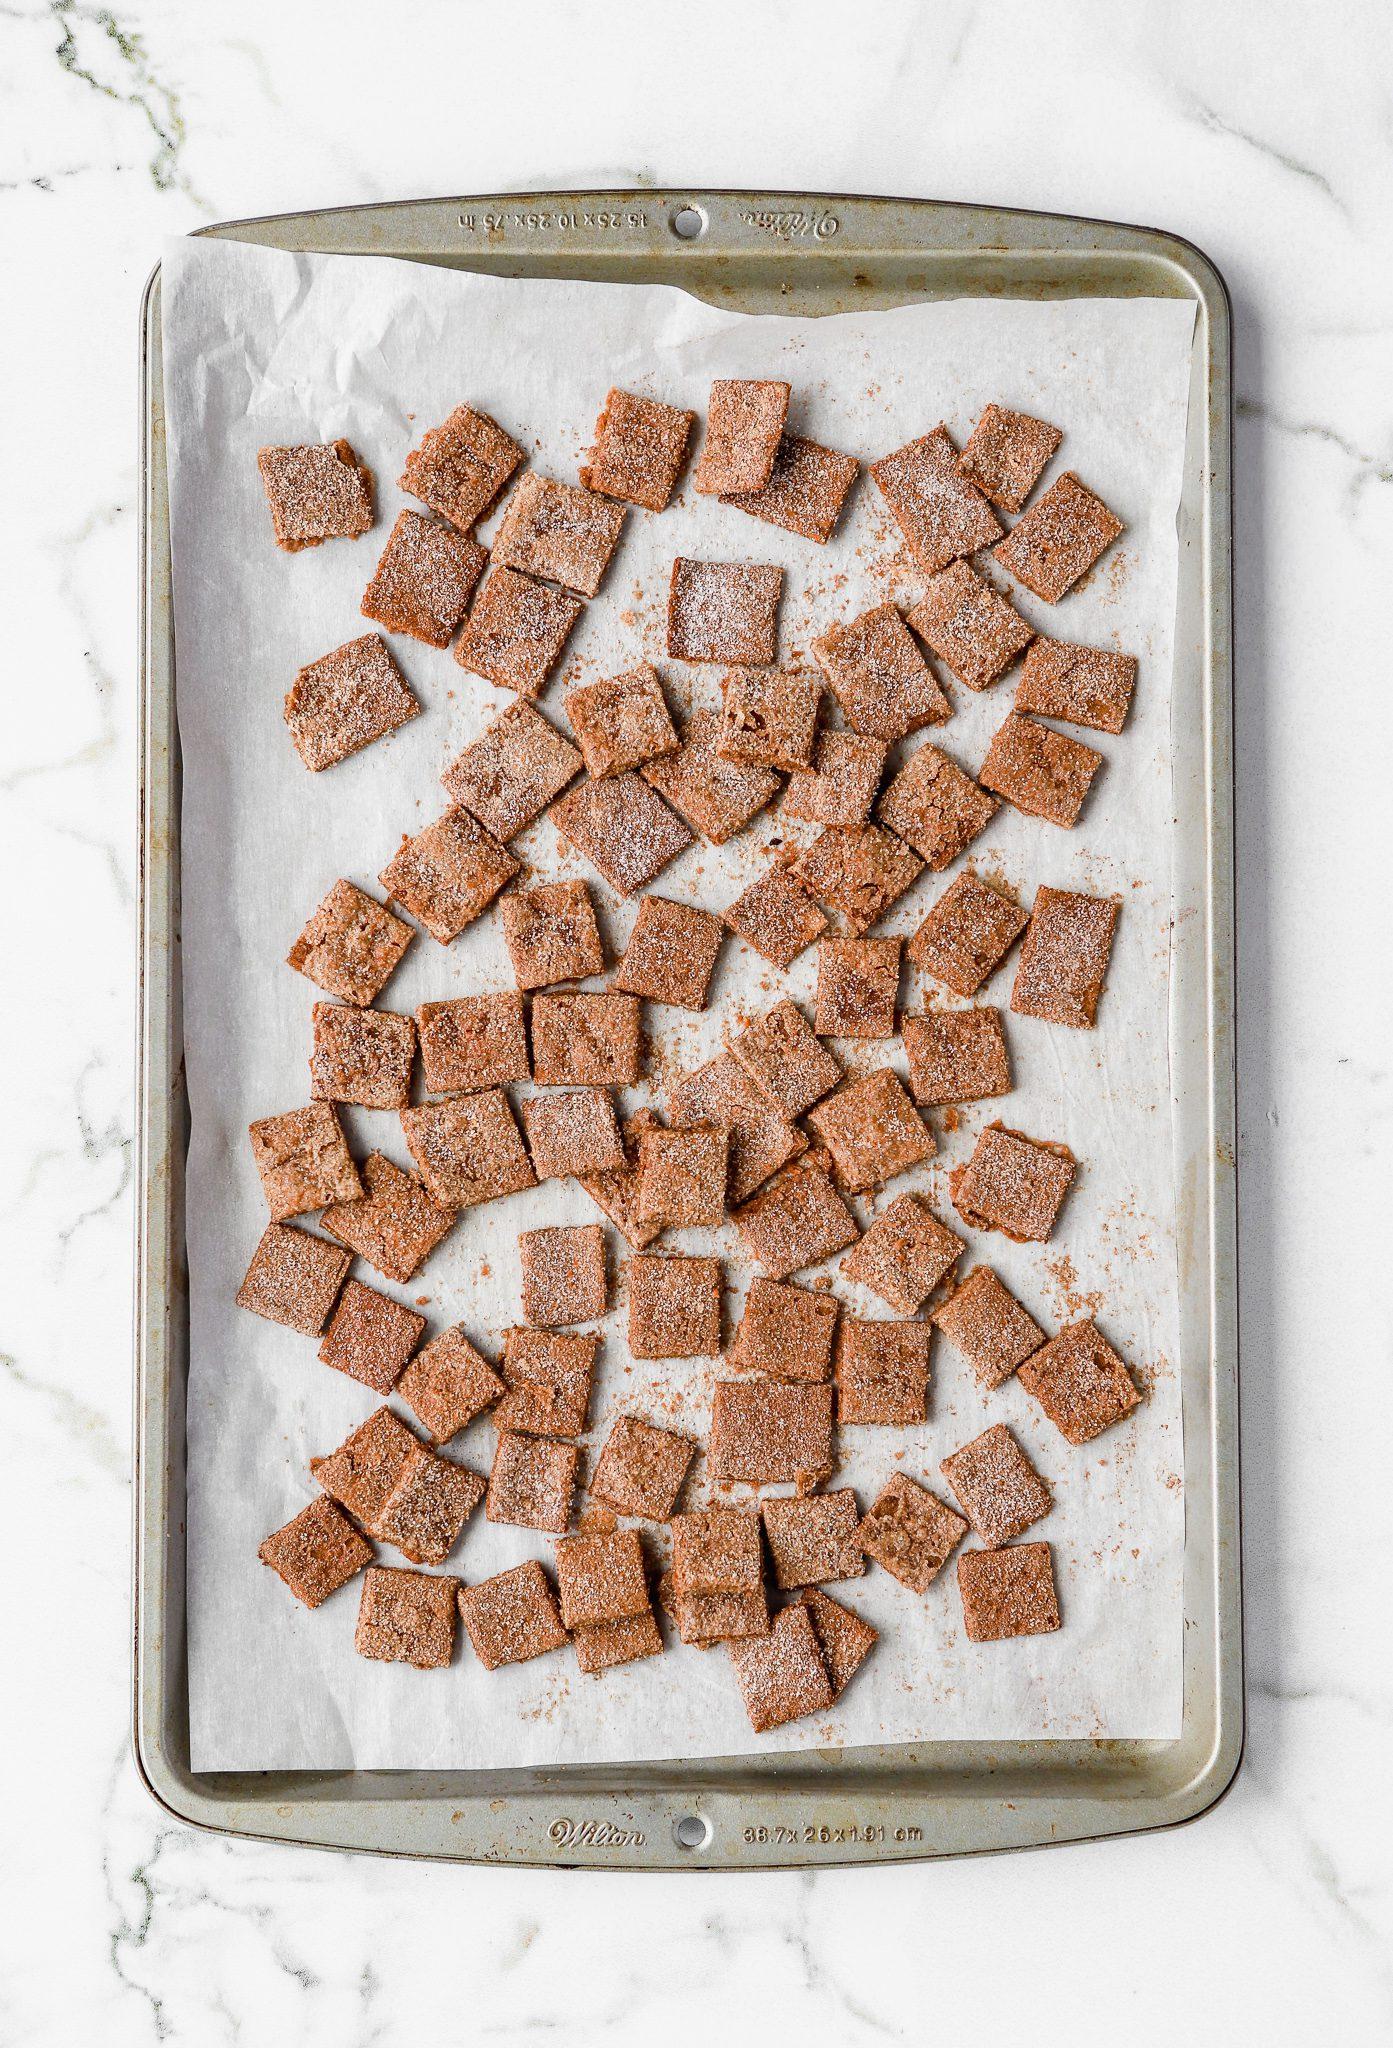 Cinnamon Toast Crunch Cereal Recipe